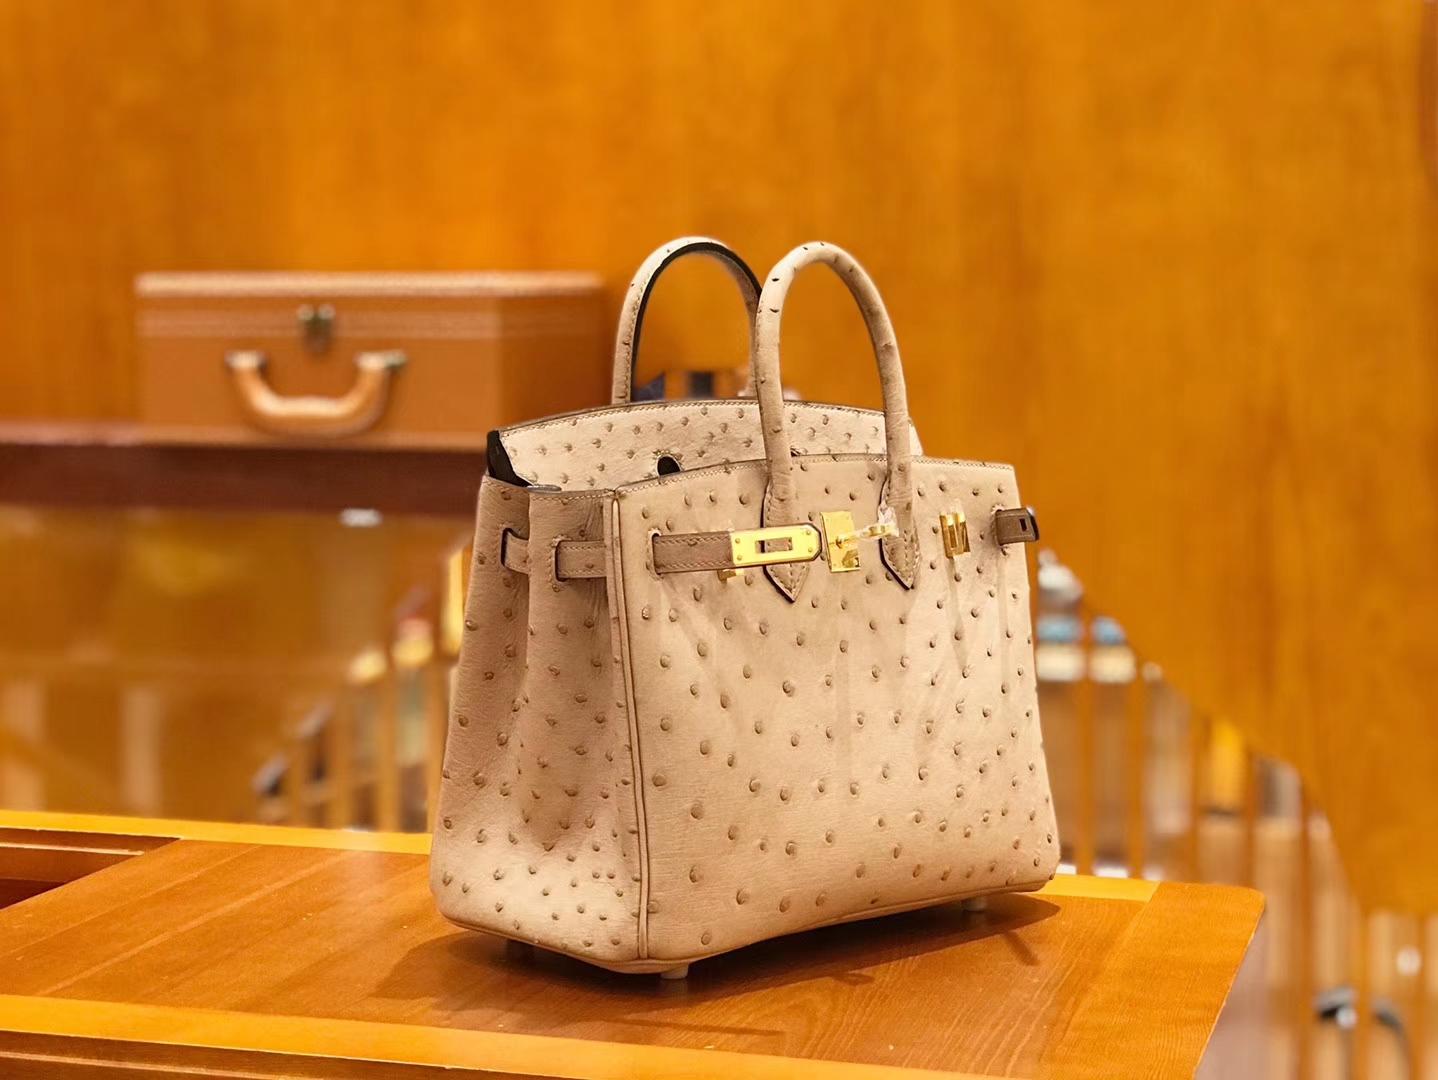 Hermès(爱马仕)Birkin 25cm 鸵鸟皮 奶粉色 全手工缝制 现货